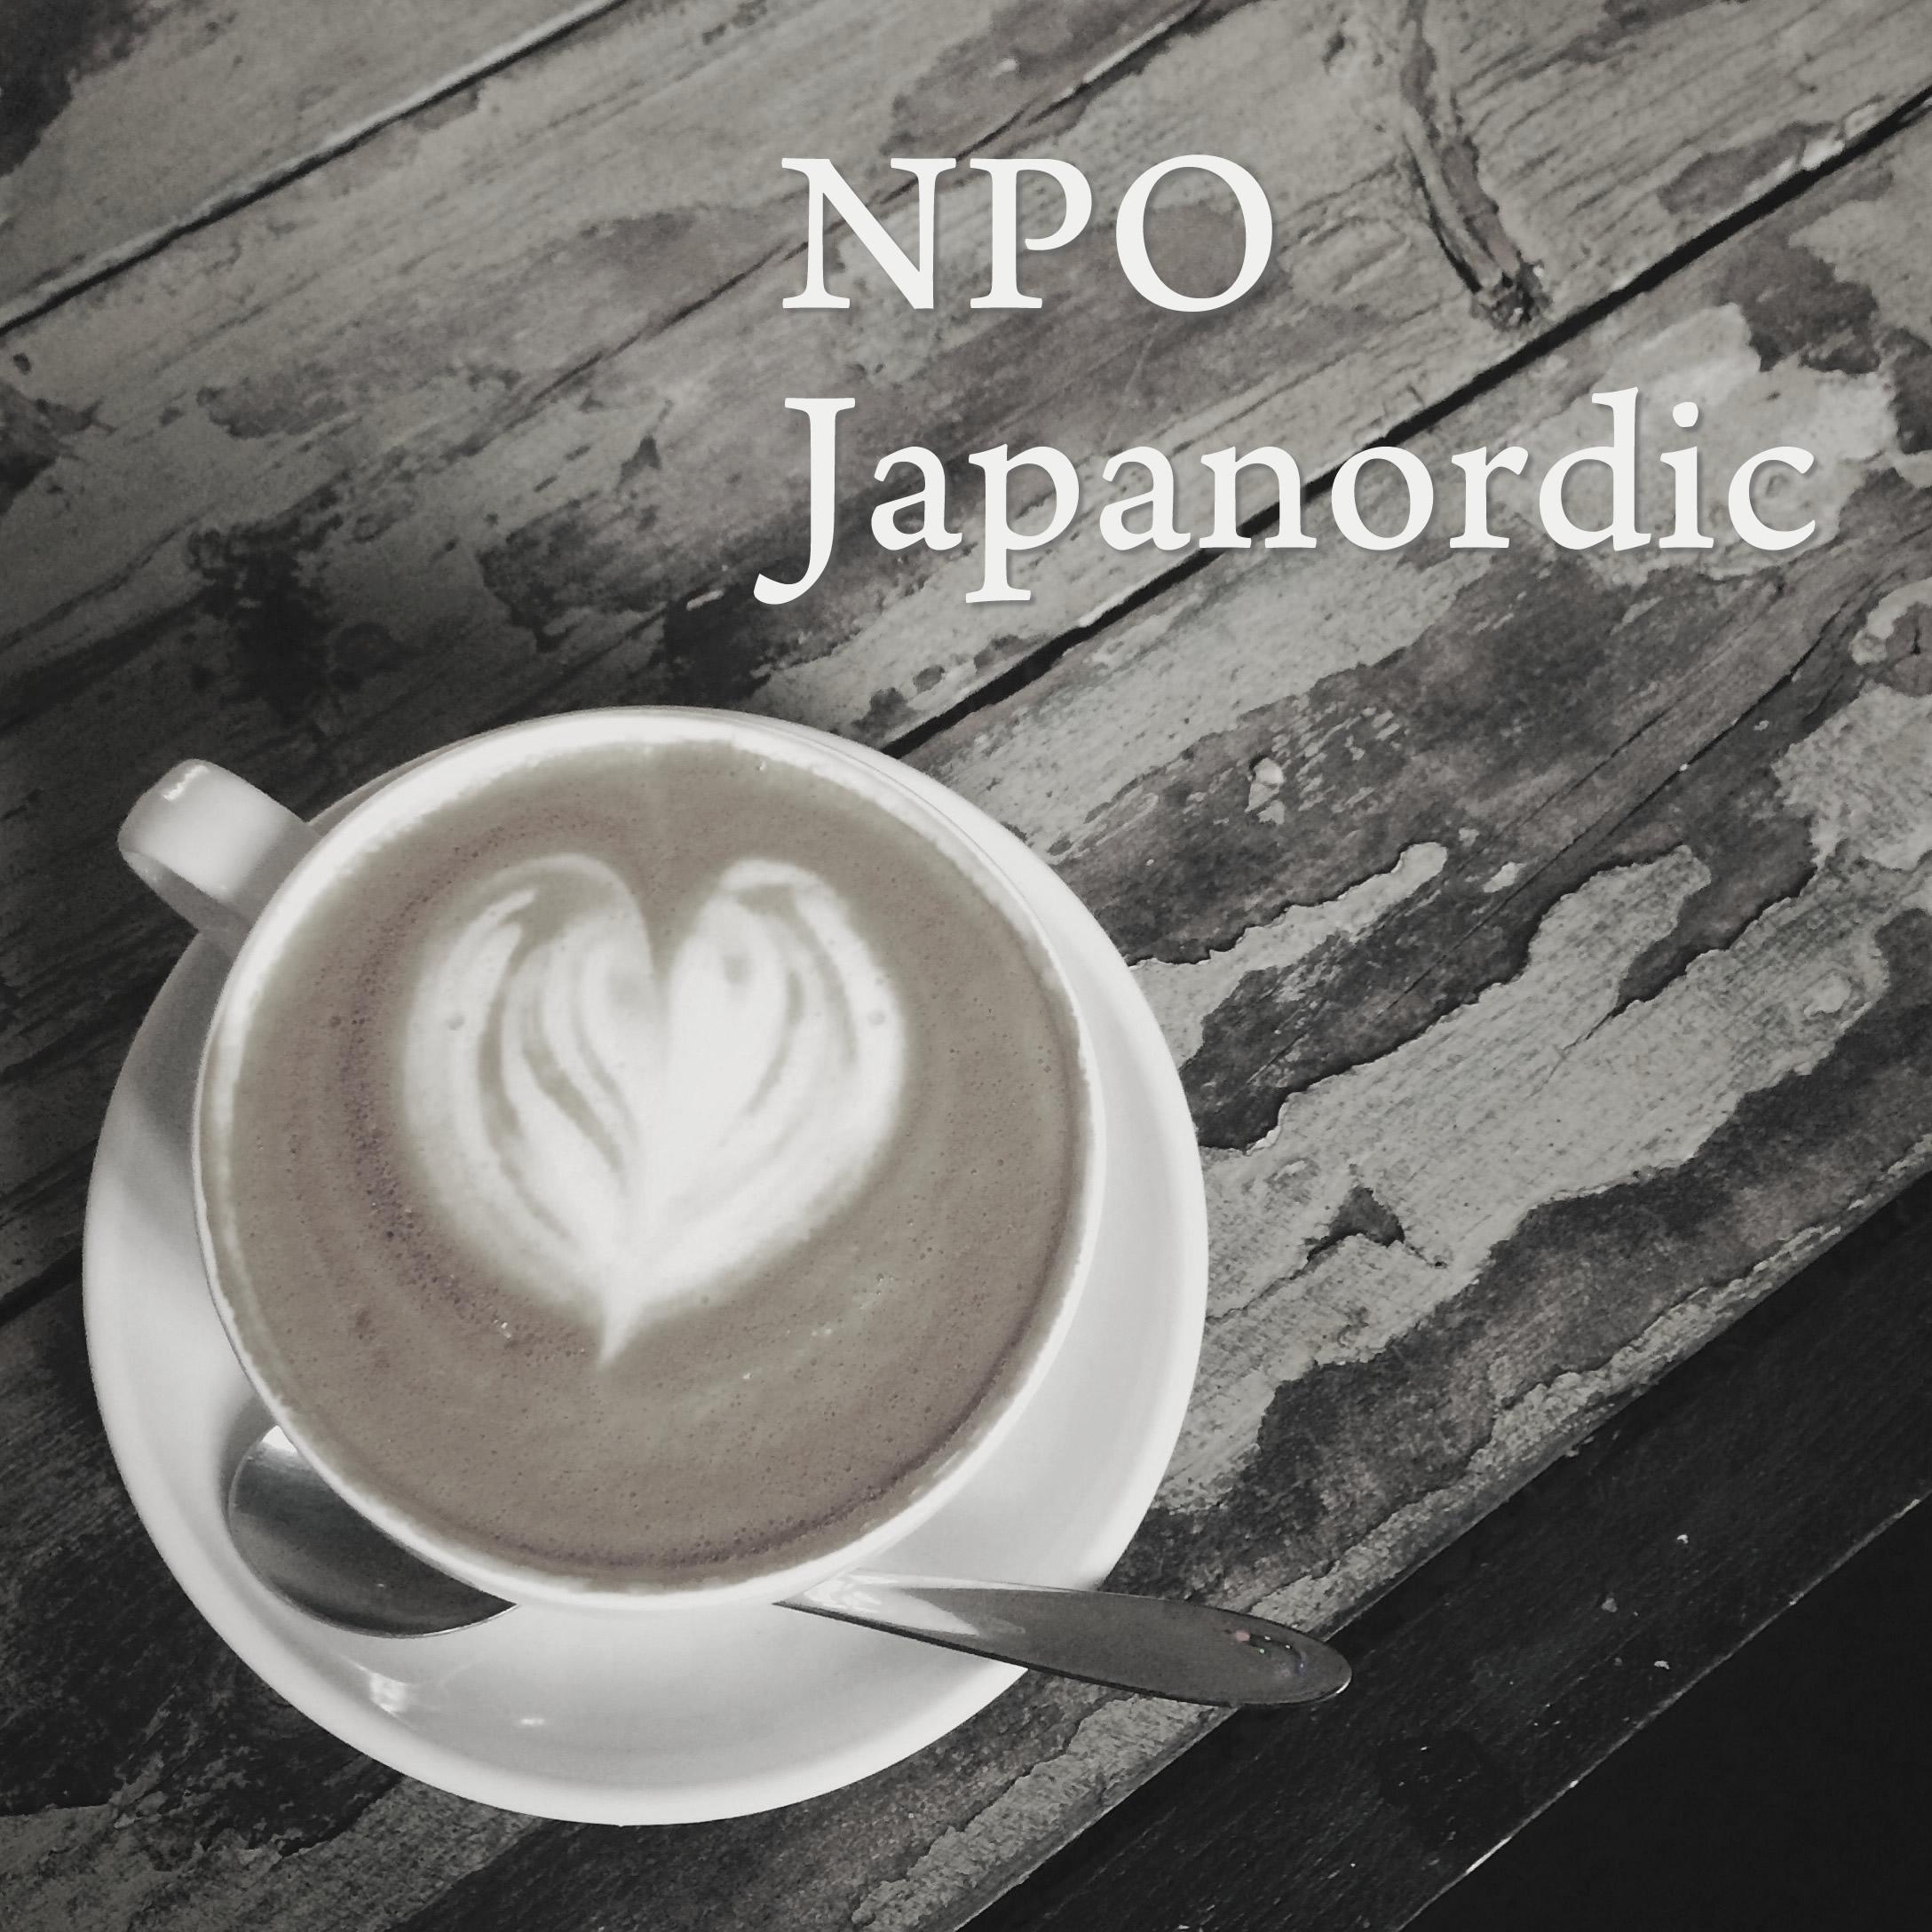 NPO Japanordic